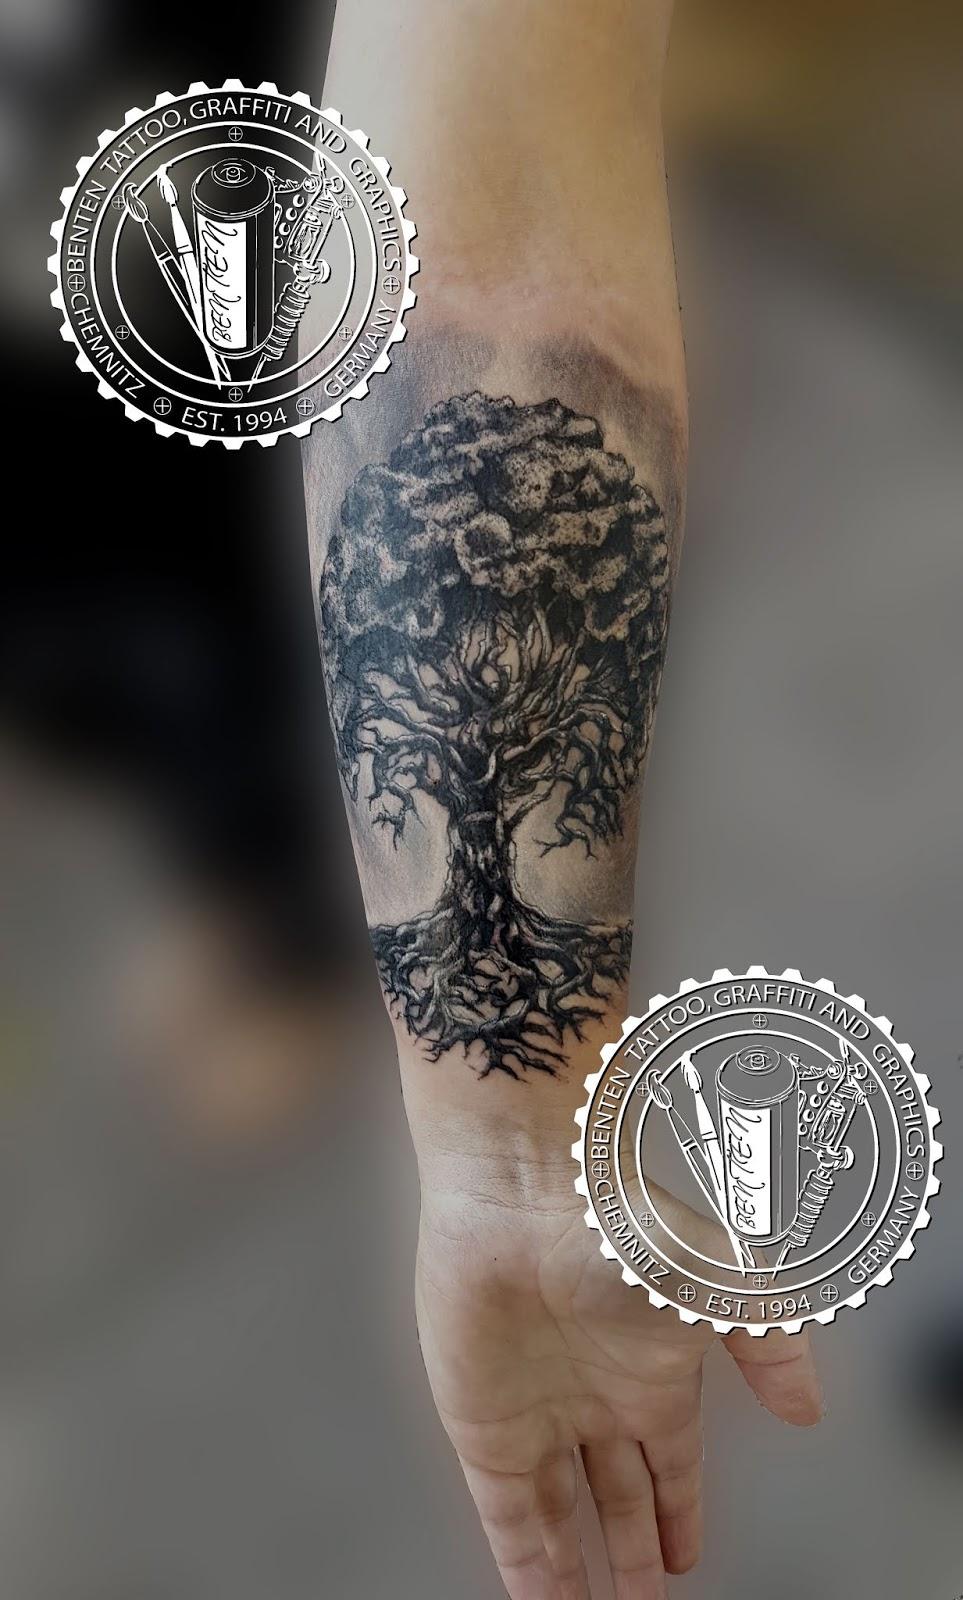 Benten Tattoo Chemnitz Tattoostudio Chemnitz